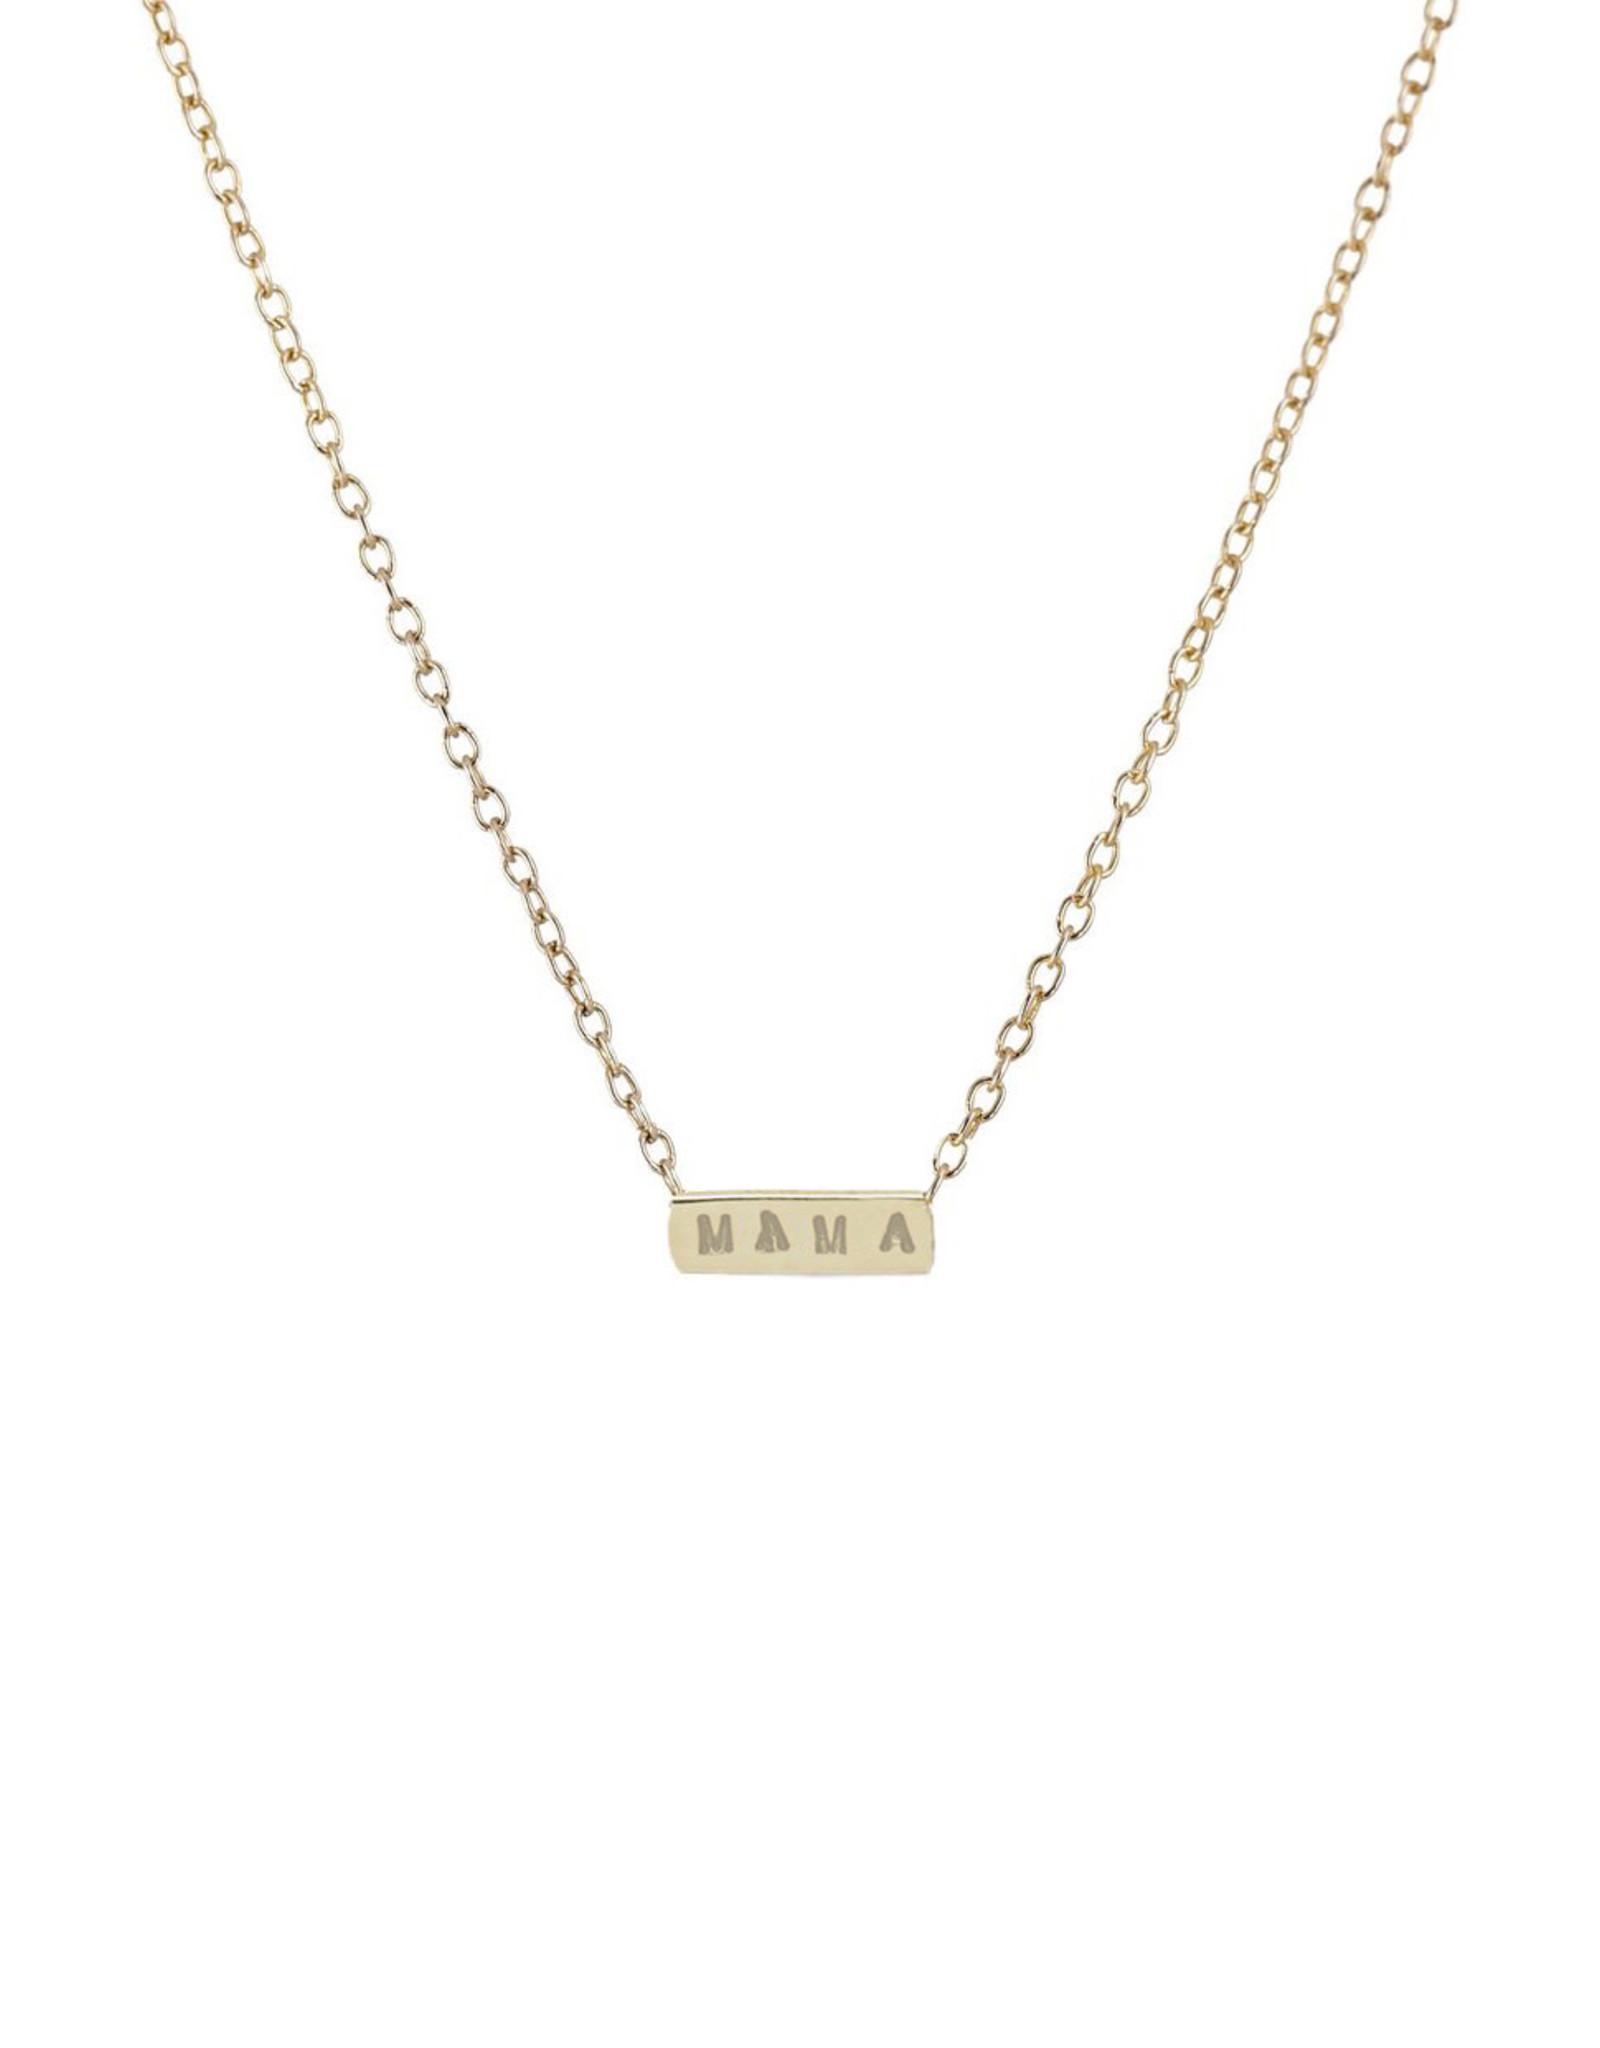 "Scosha 'MAMA' Bar Necklace in Gold, Hand-Stamped ""MAMA"""